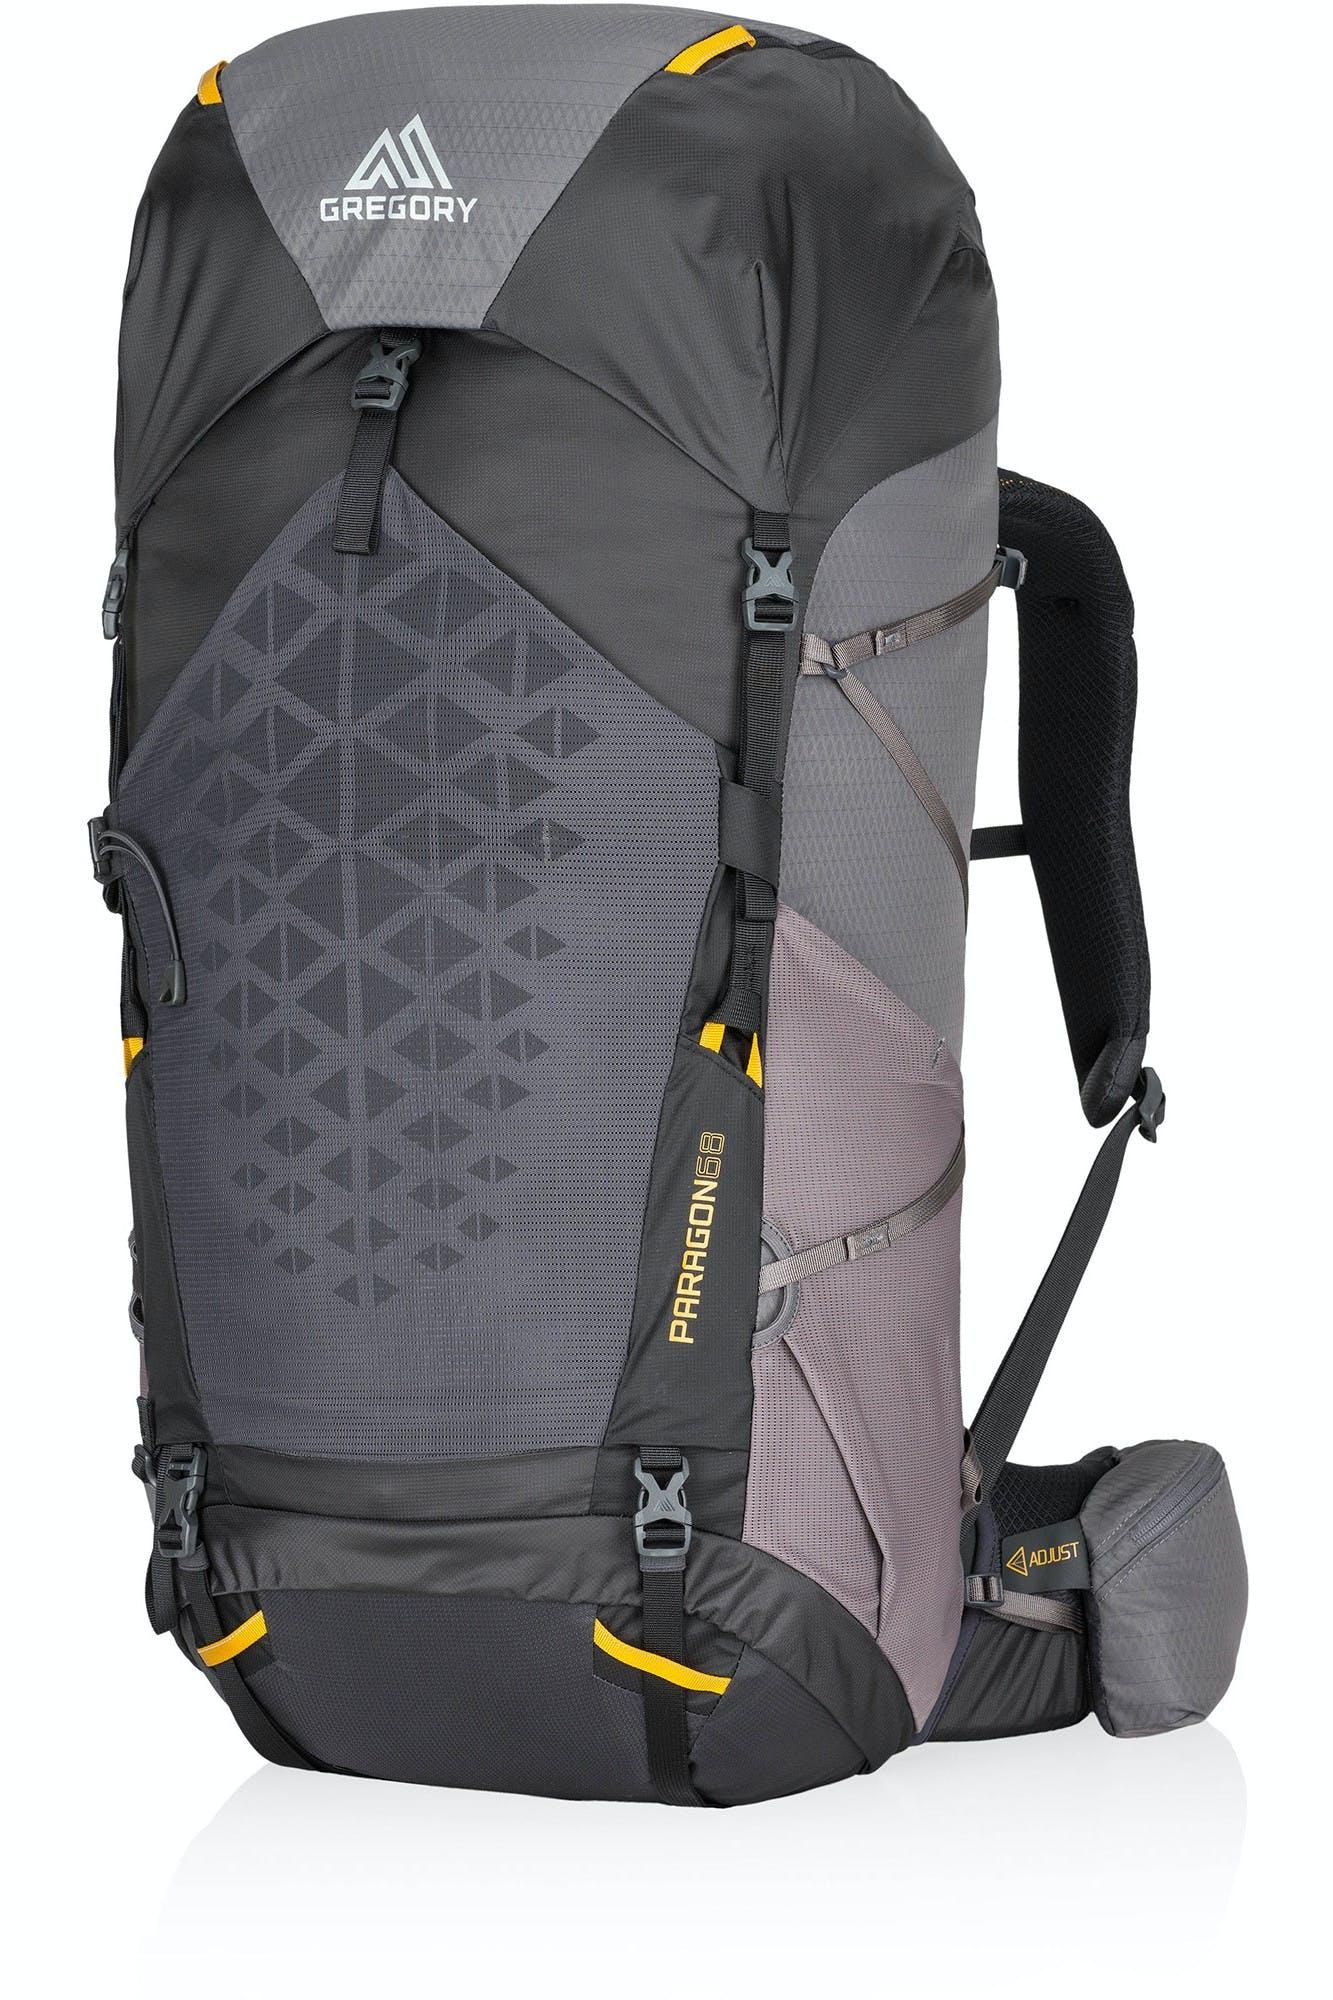 Gregory - Paragon 58 Backpack - SM/MD - Sunset Grey